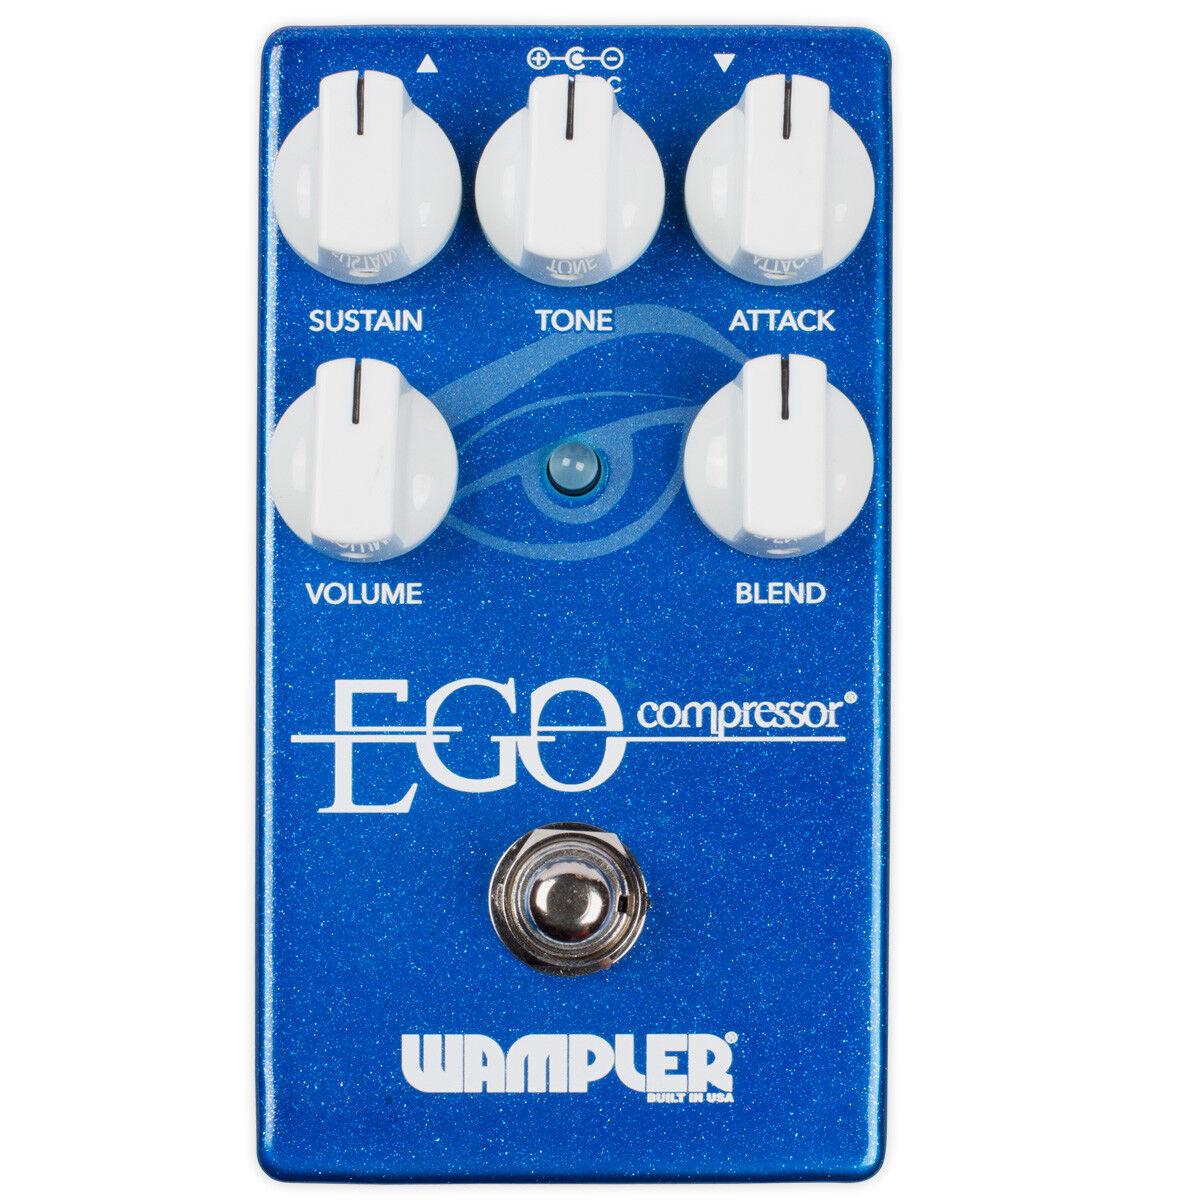 New Wampler Ego Compressor Guitar Effects Pedal